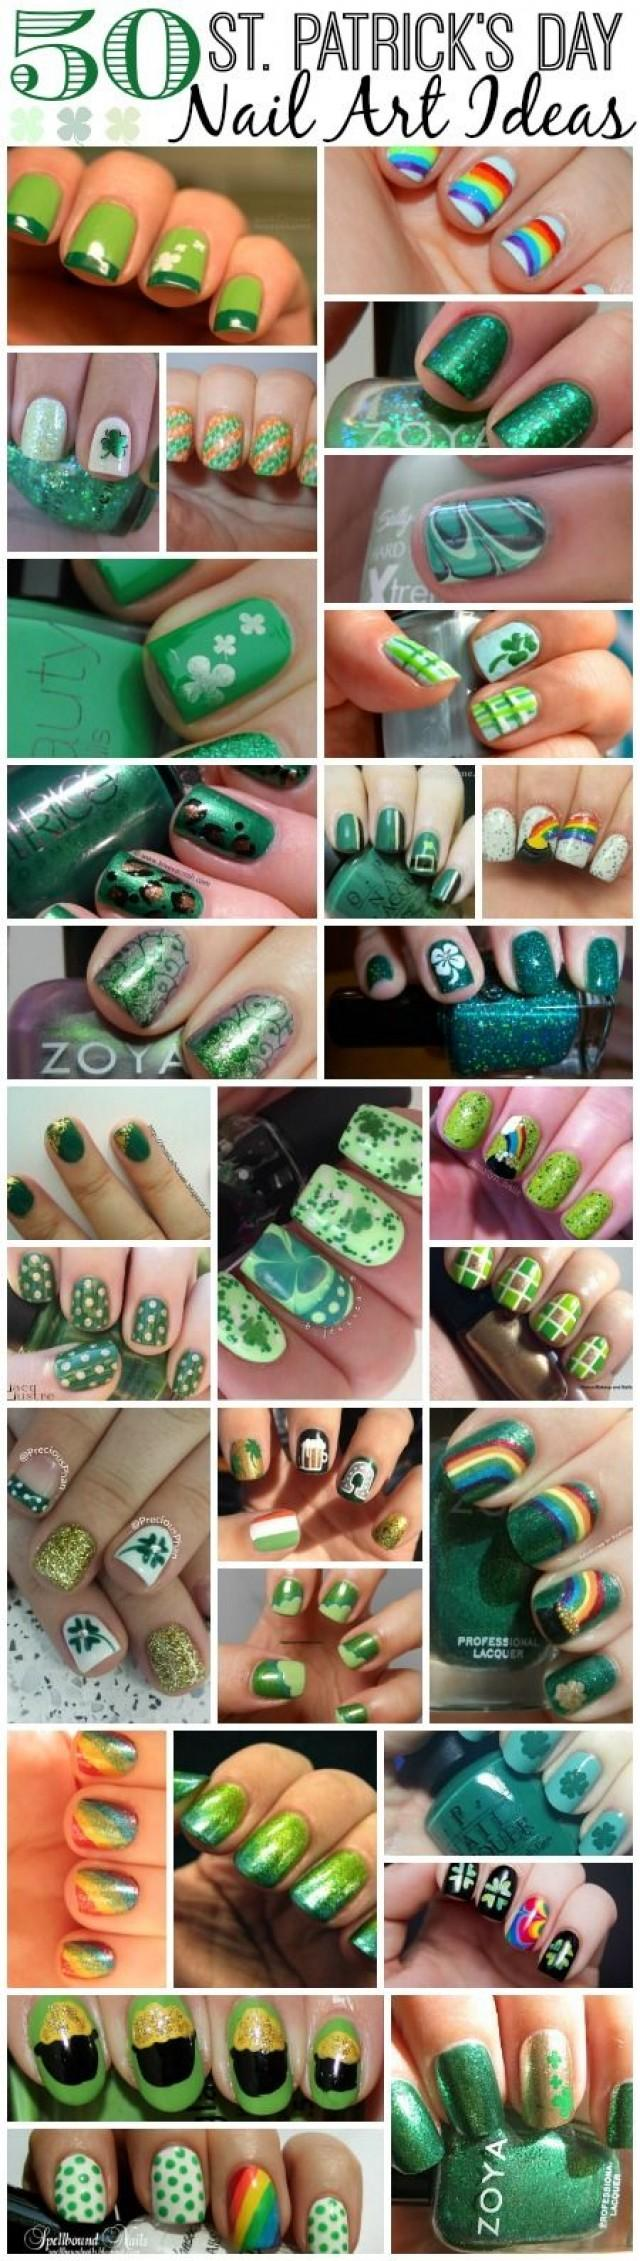 Wedding Nail Designs - St. Patrick\'s Day Nail Art Ideas #2046285 ...